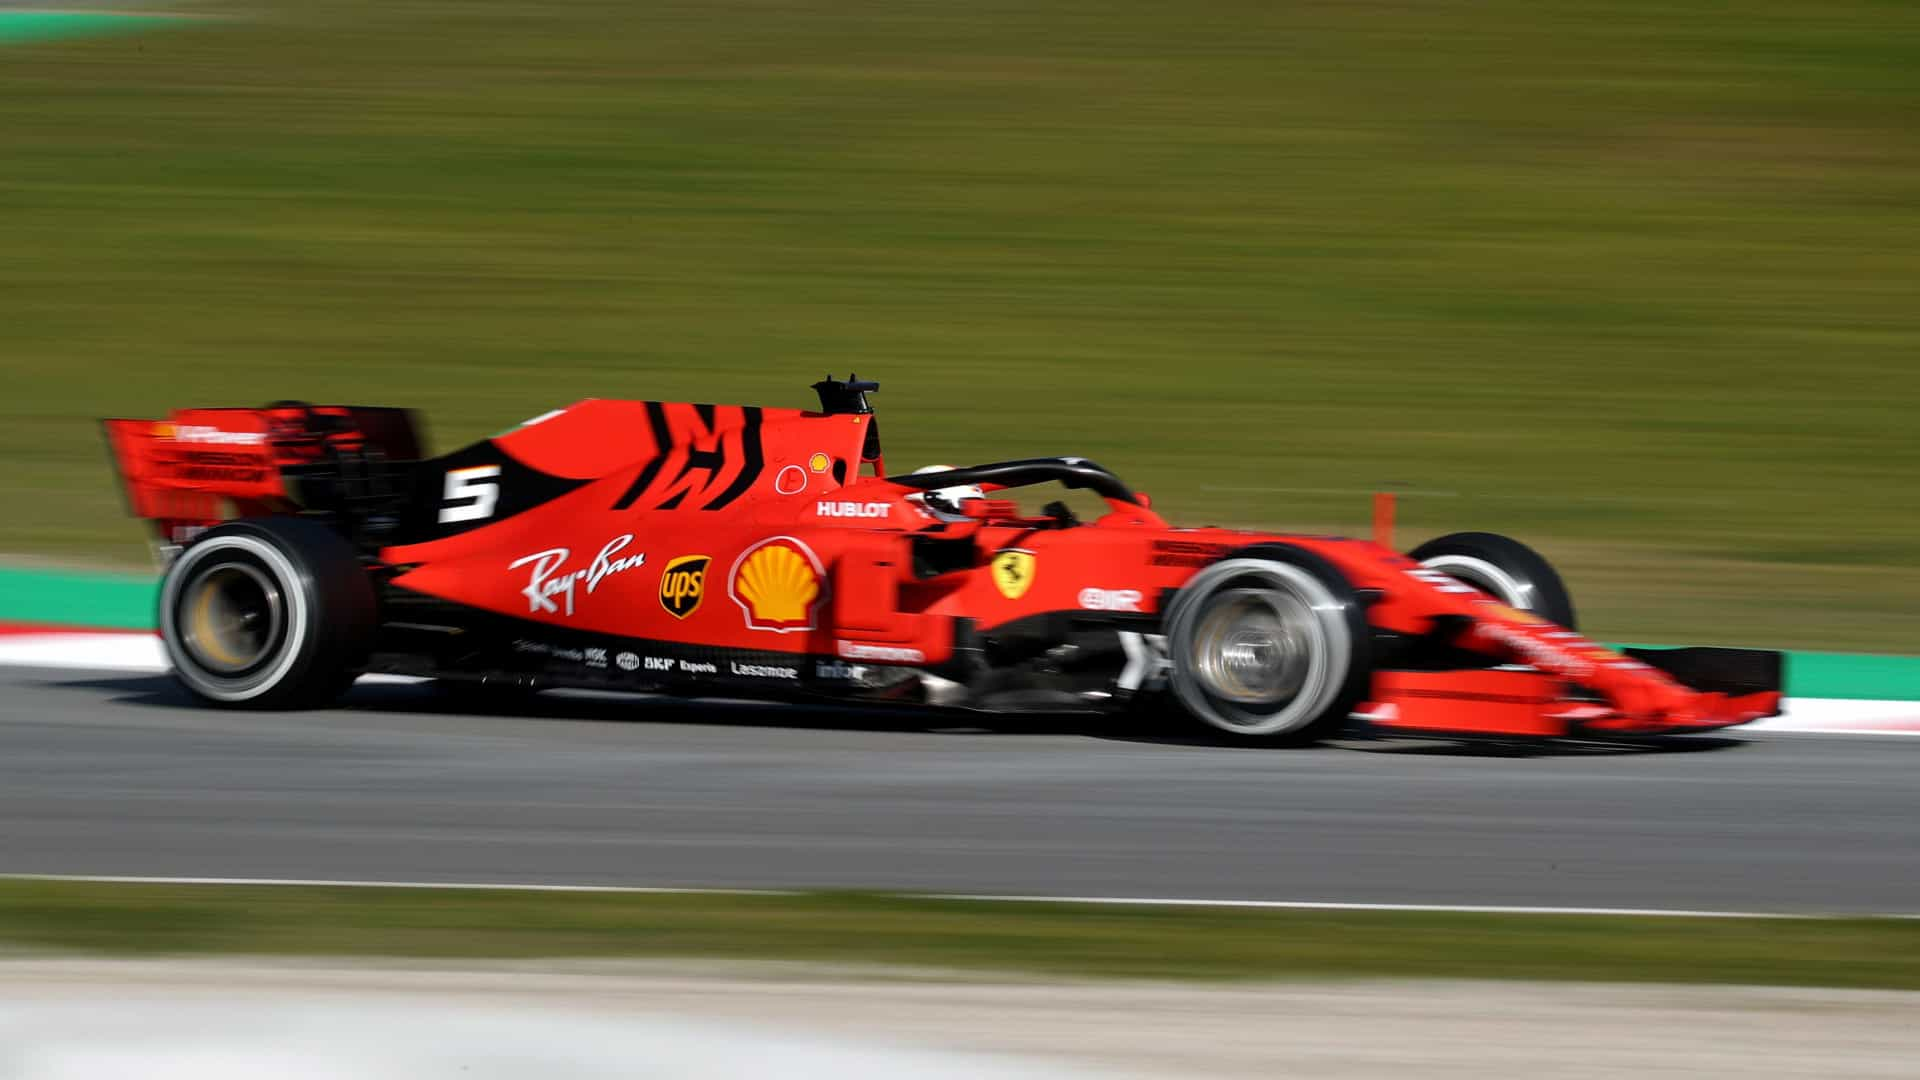 Ferrari - Leclerc garante pole position na Rússia e Ferrari mantém boa fase na temporada